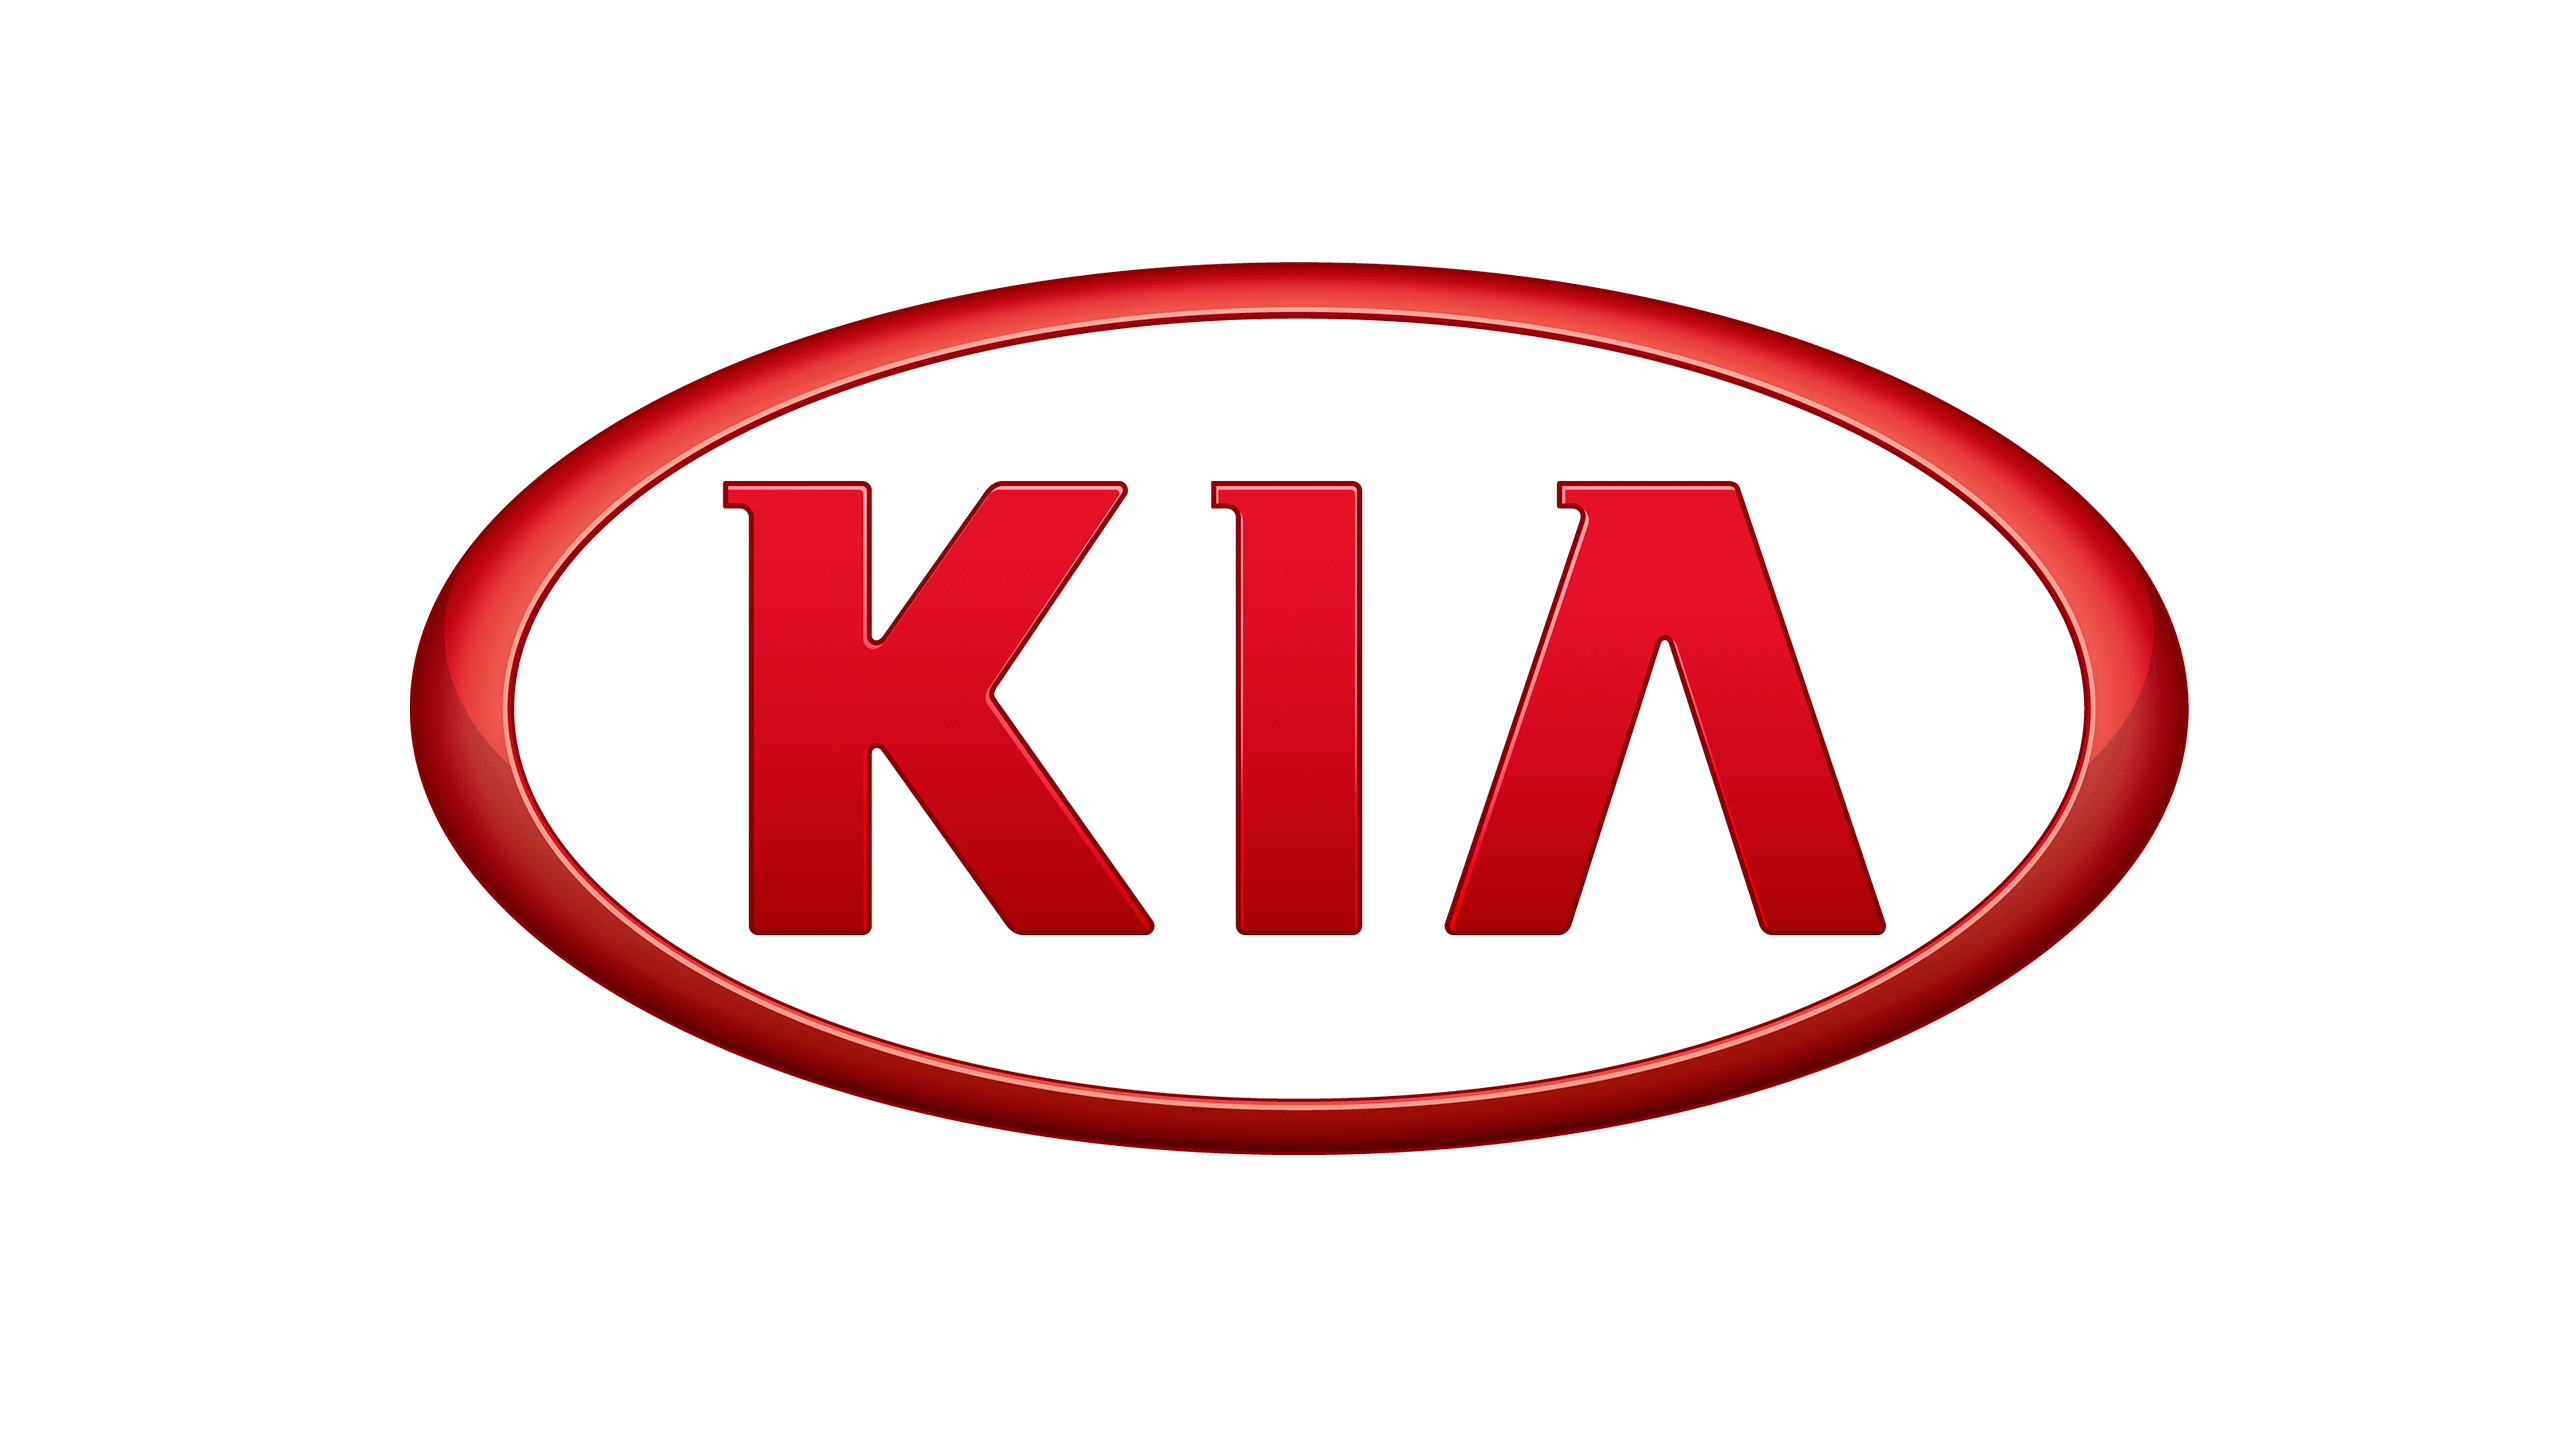 Kia-logo-2560×1440